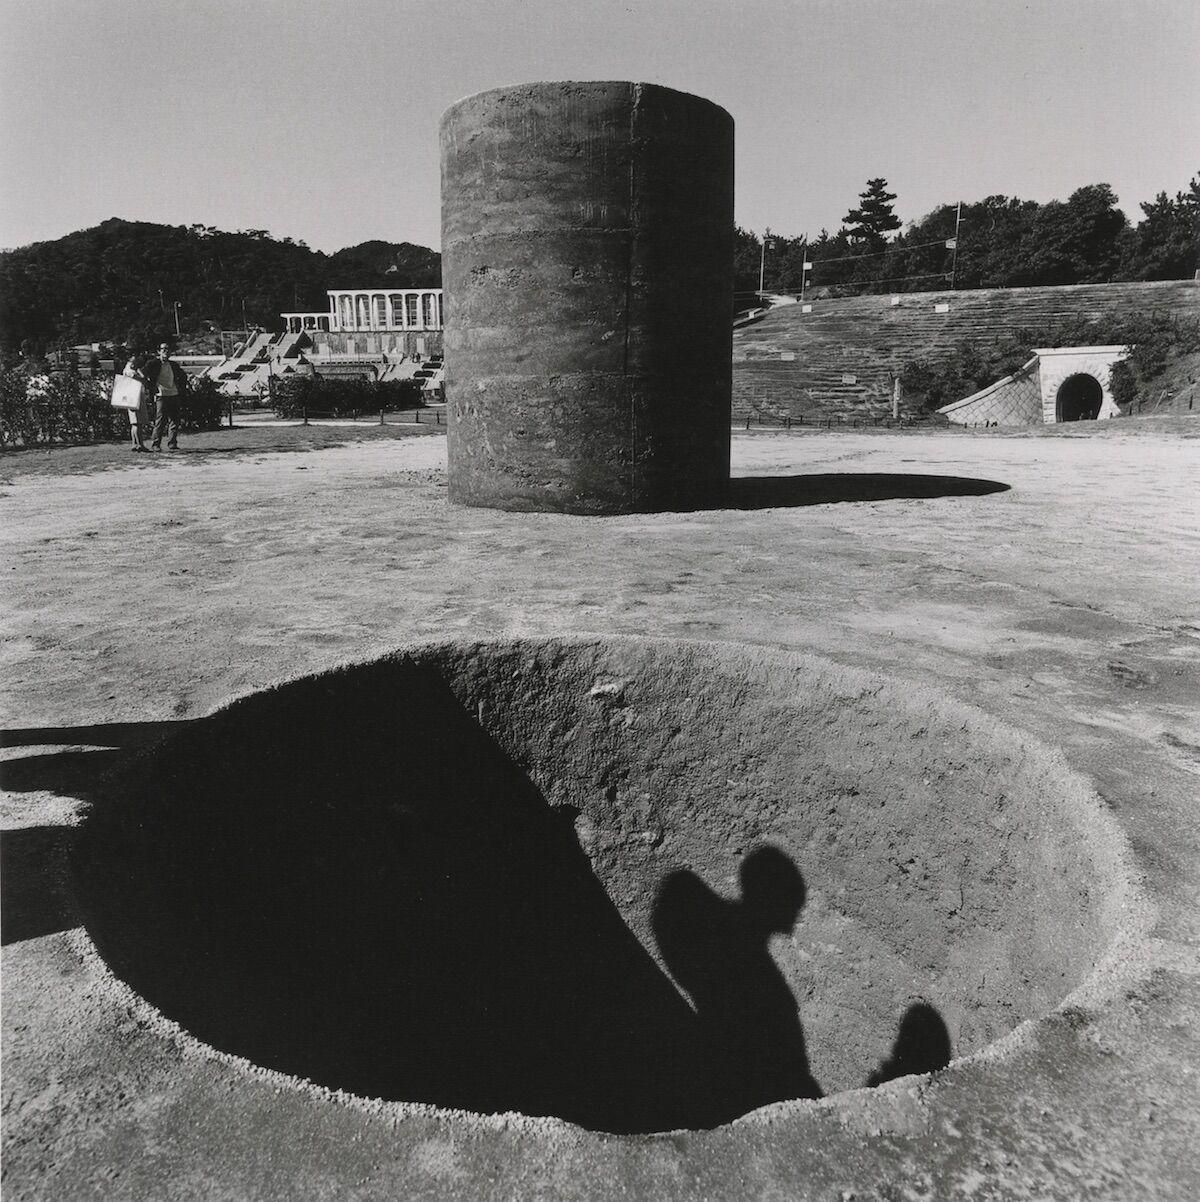 Nobuo Sekine, Phase–Mother Earth (1968), installation view at the 1st Kobe Suma Rikyu Park Contemporary Sculpture Exhibition, Kobe, Japan, 1968. Photo by Osamu Murai. © Nobuo Sekine.